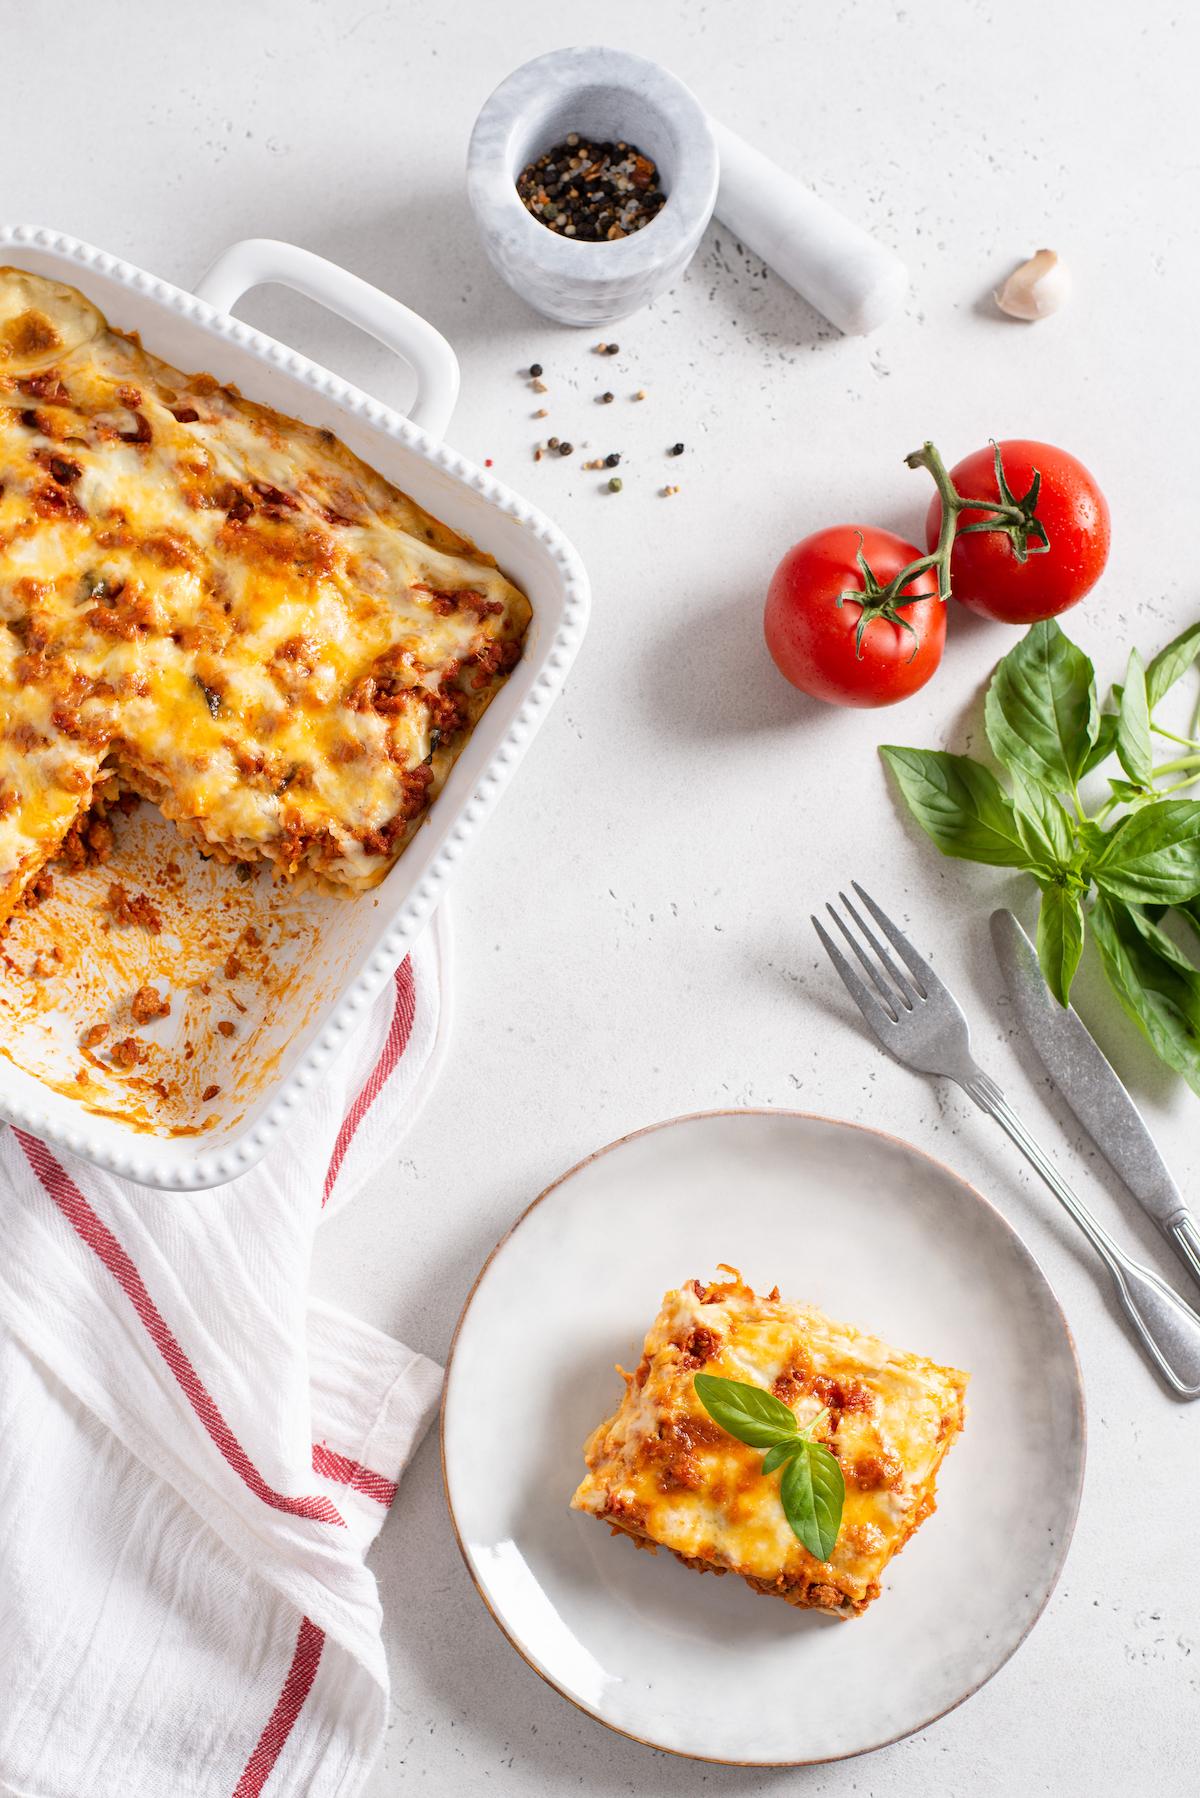 Casey's Delicious and Nutritious Ground Turkey Lasagna